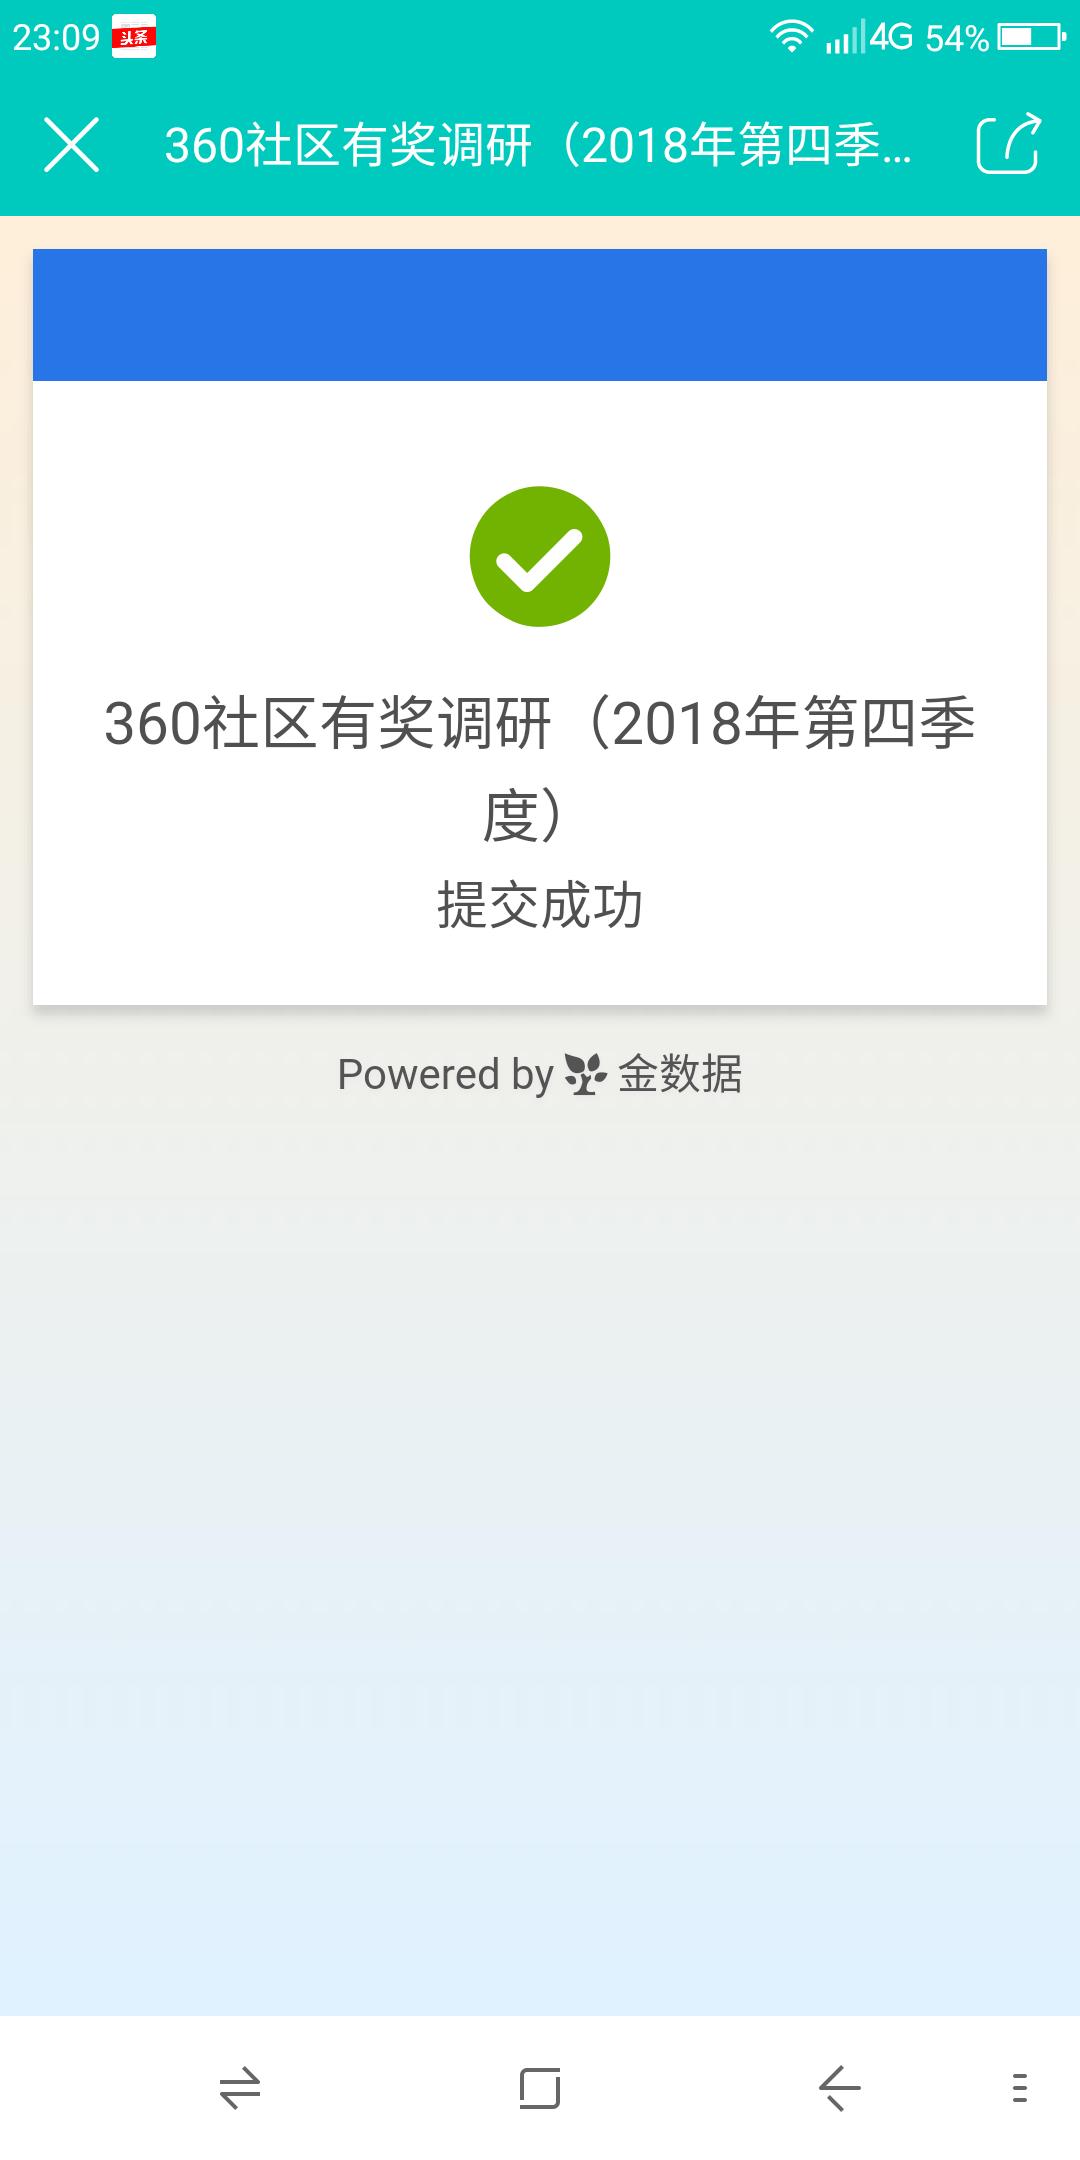 Screenshot_2019-01-04-23-09-55.png